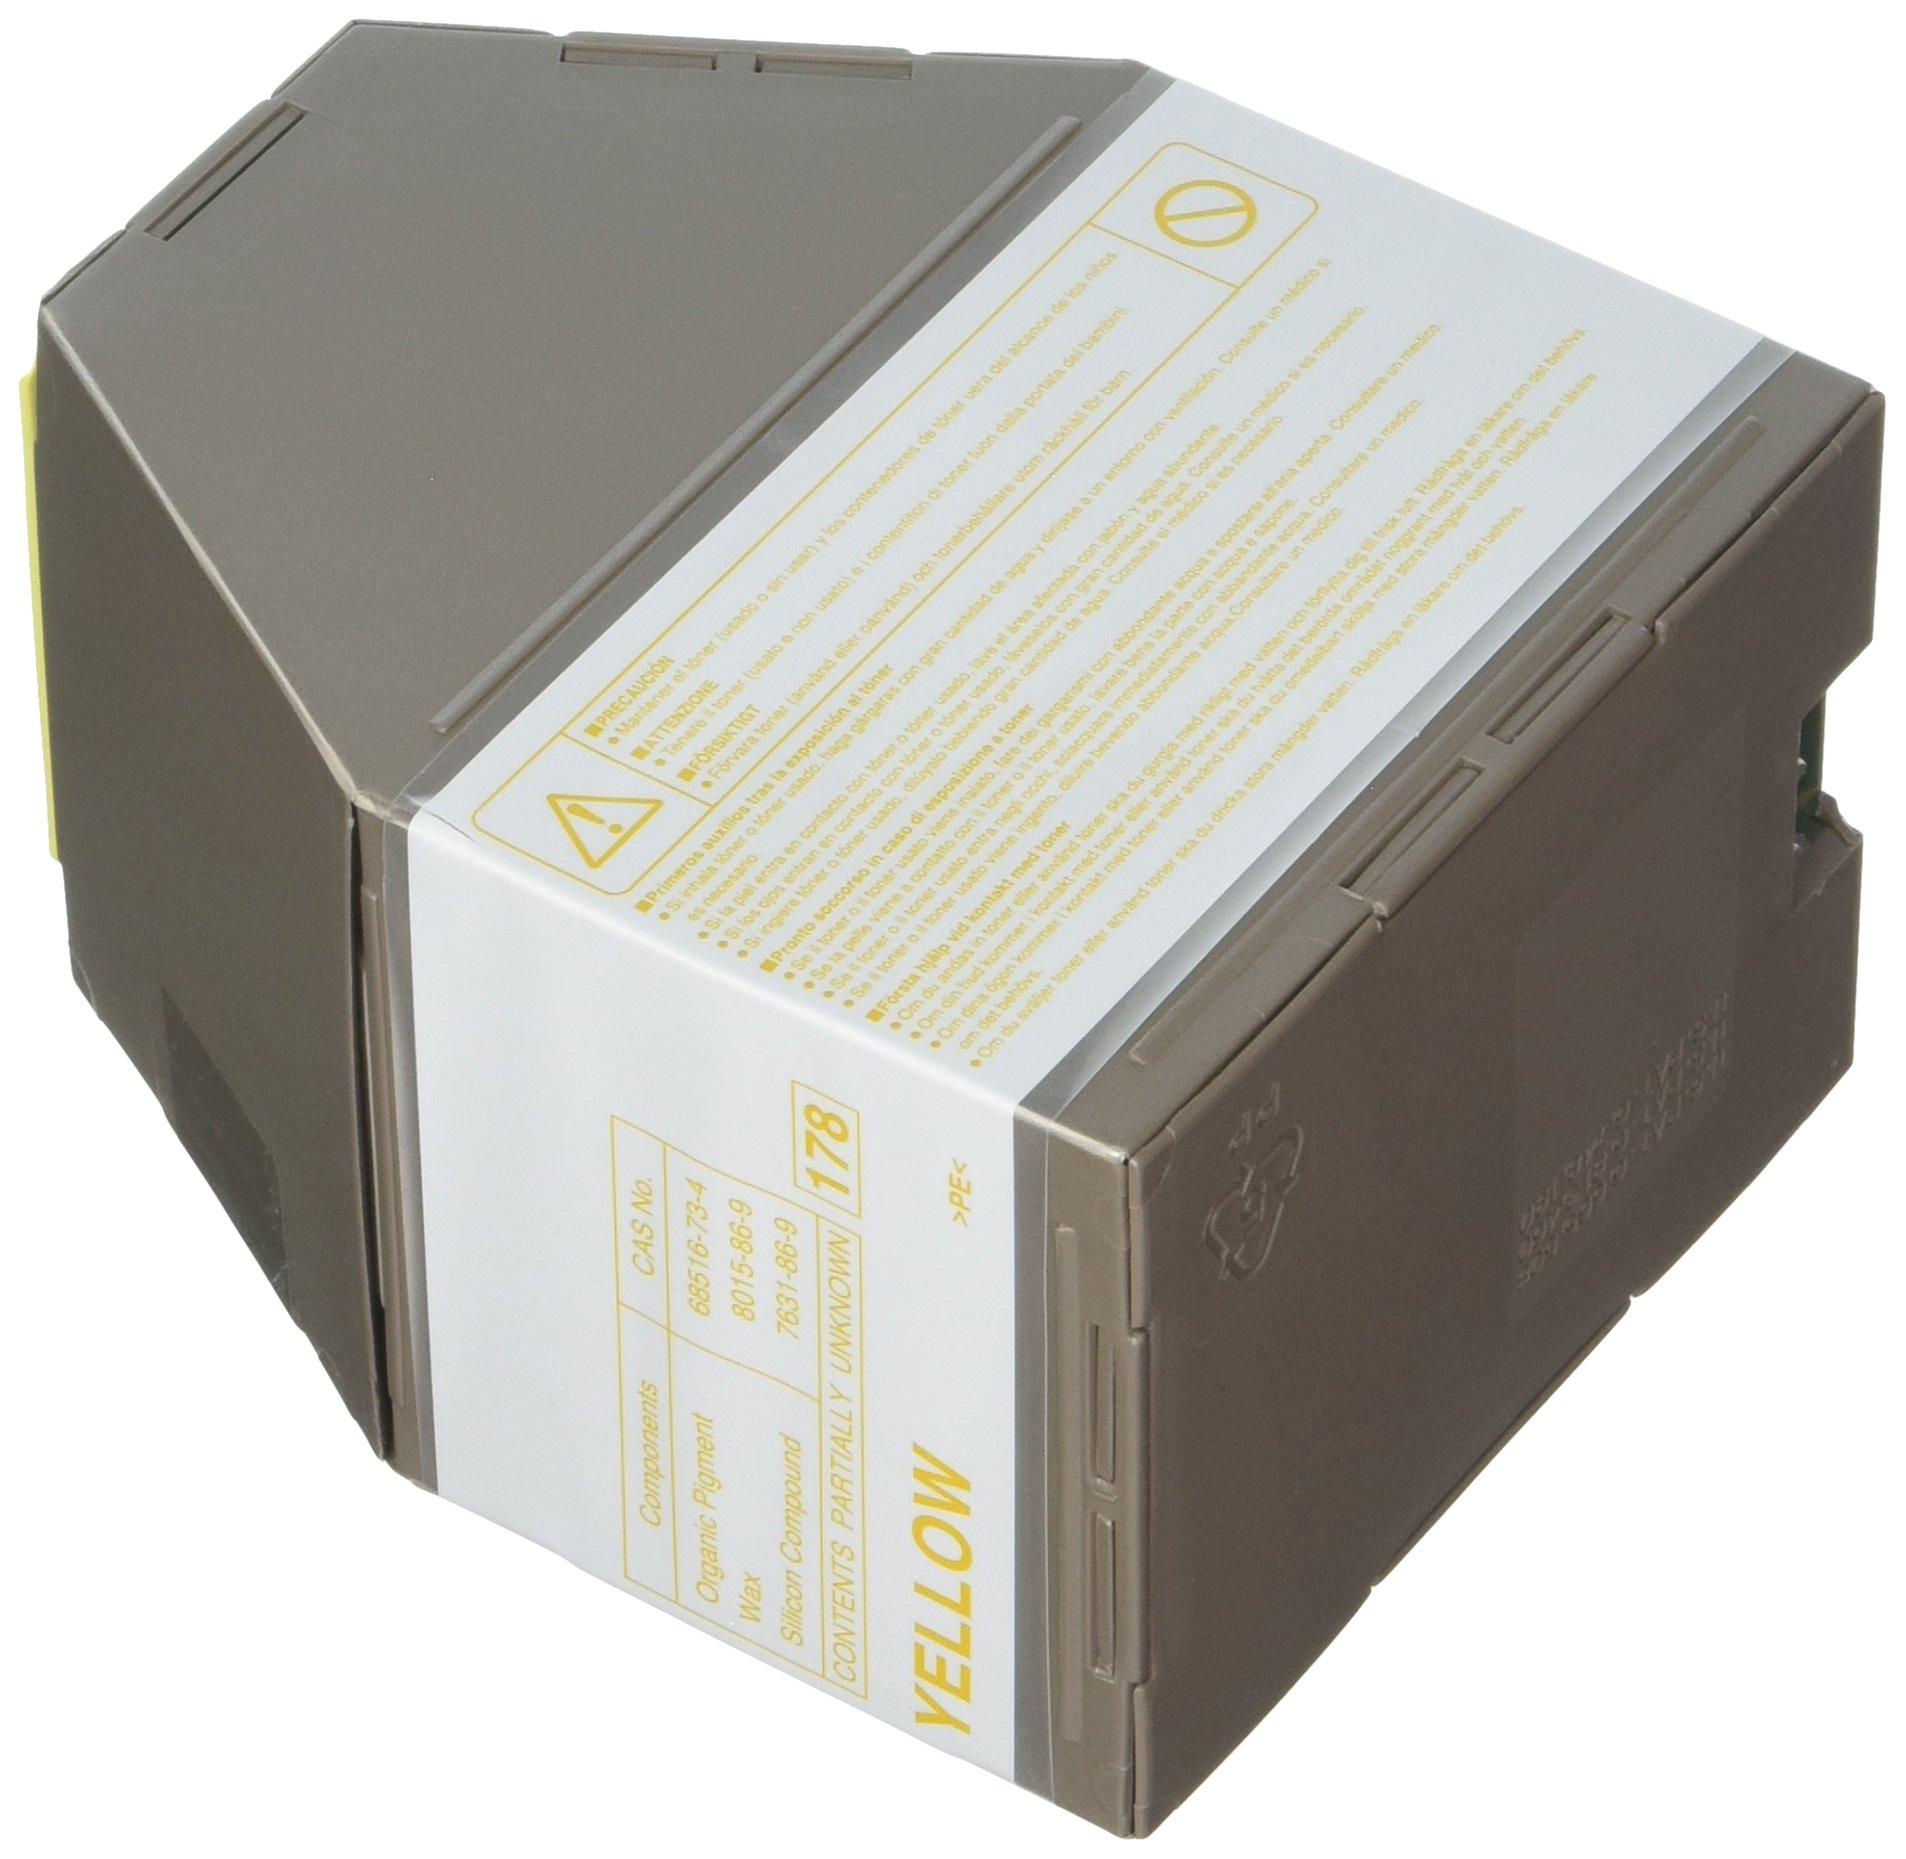 Toner Original RICOH 888341 Type R1 Yellow para 3228C 3235C